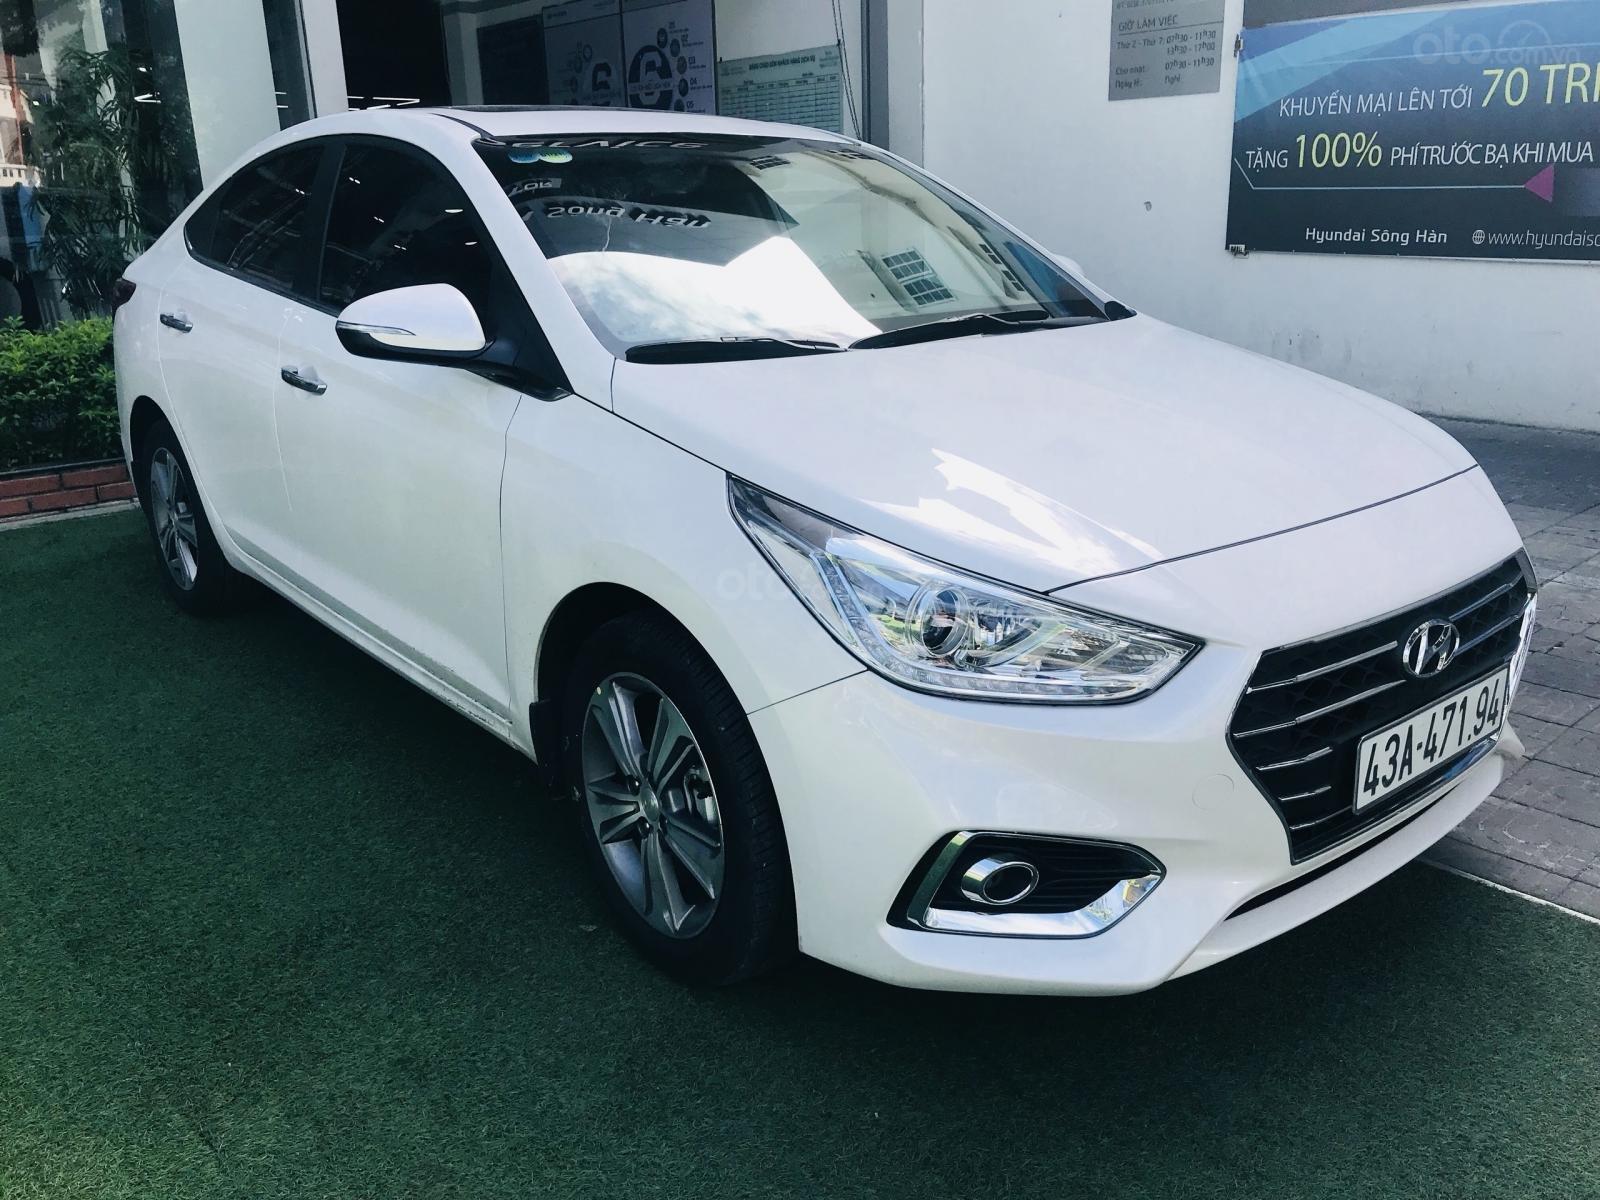 Lợi xăng, Grab số 1, Hyundai Accent 2019, hotline: 0974064605 (3)